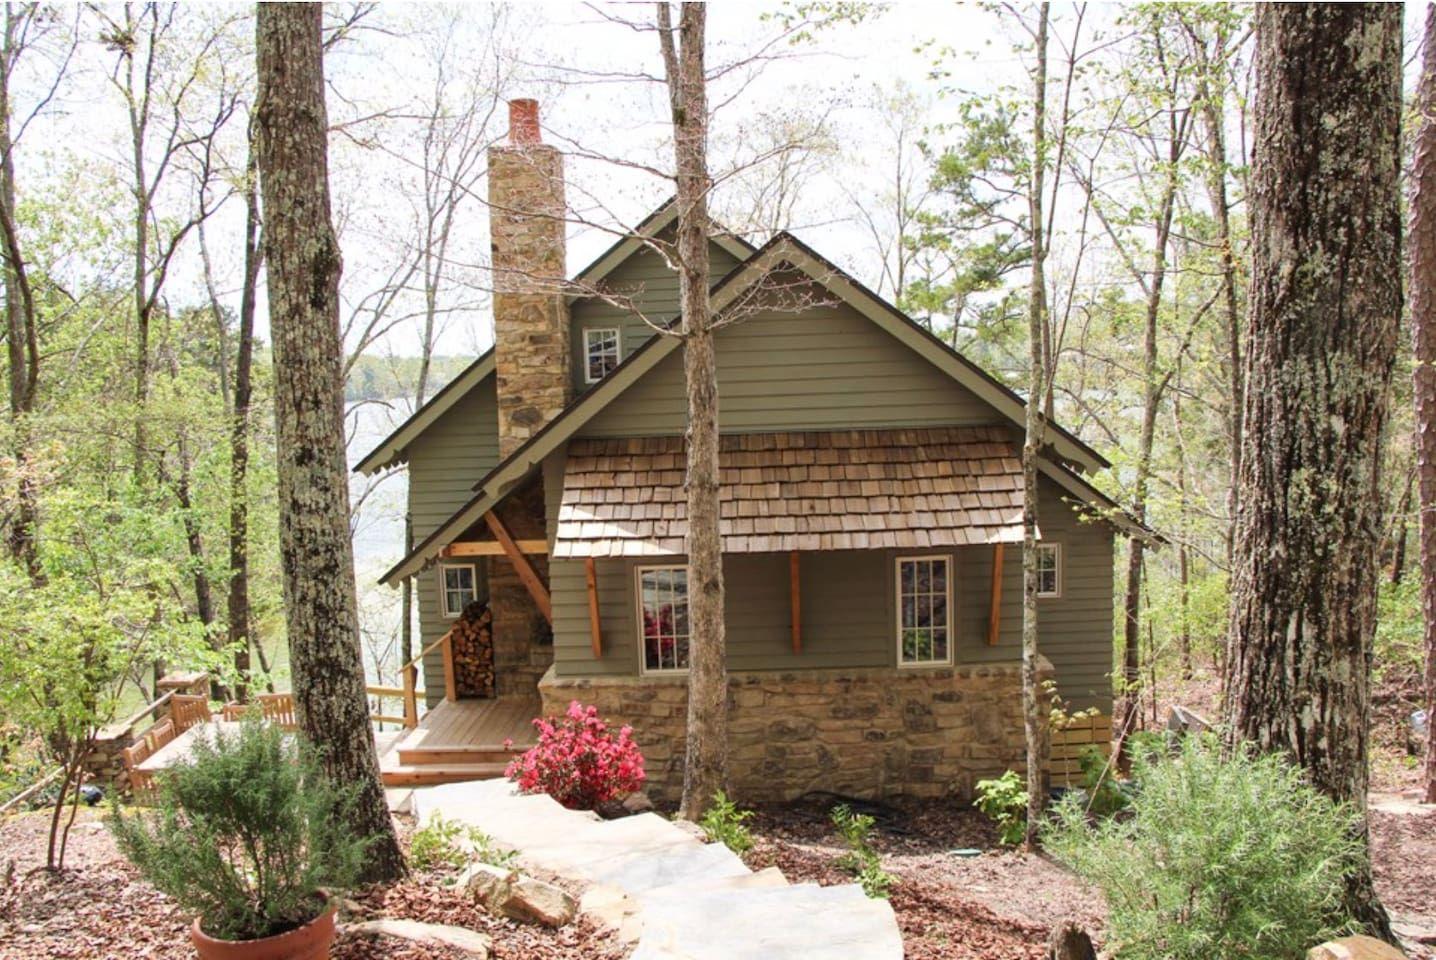 Heirloom cabin lewis smith lake alabama houses for